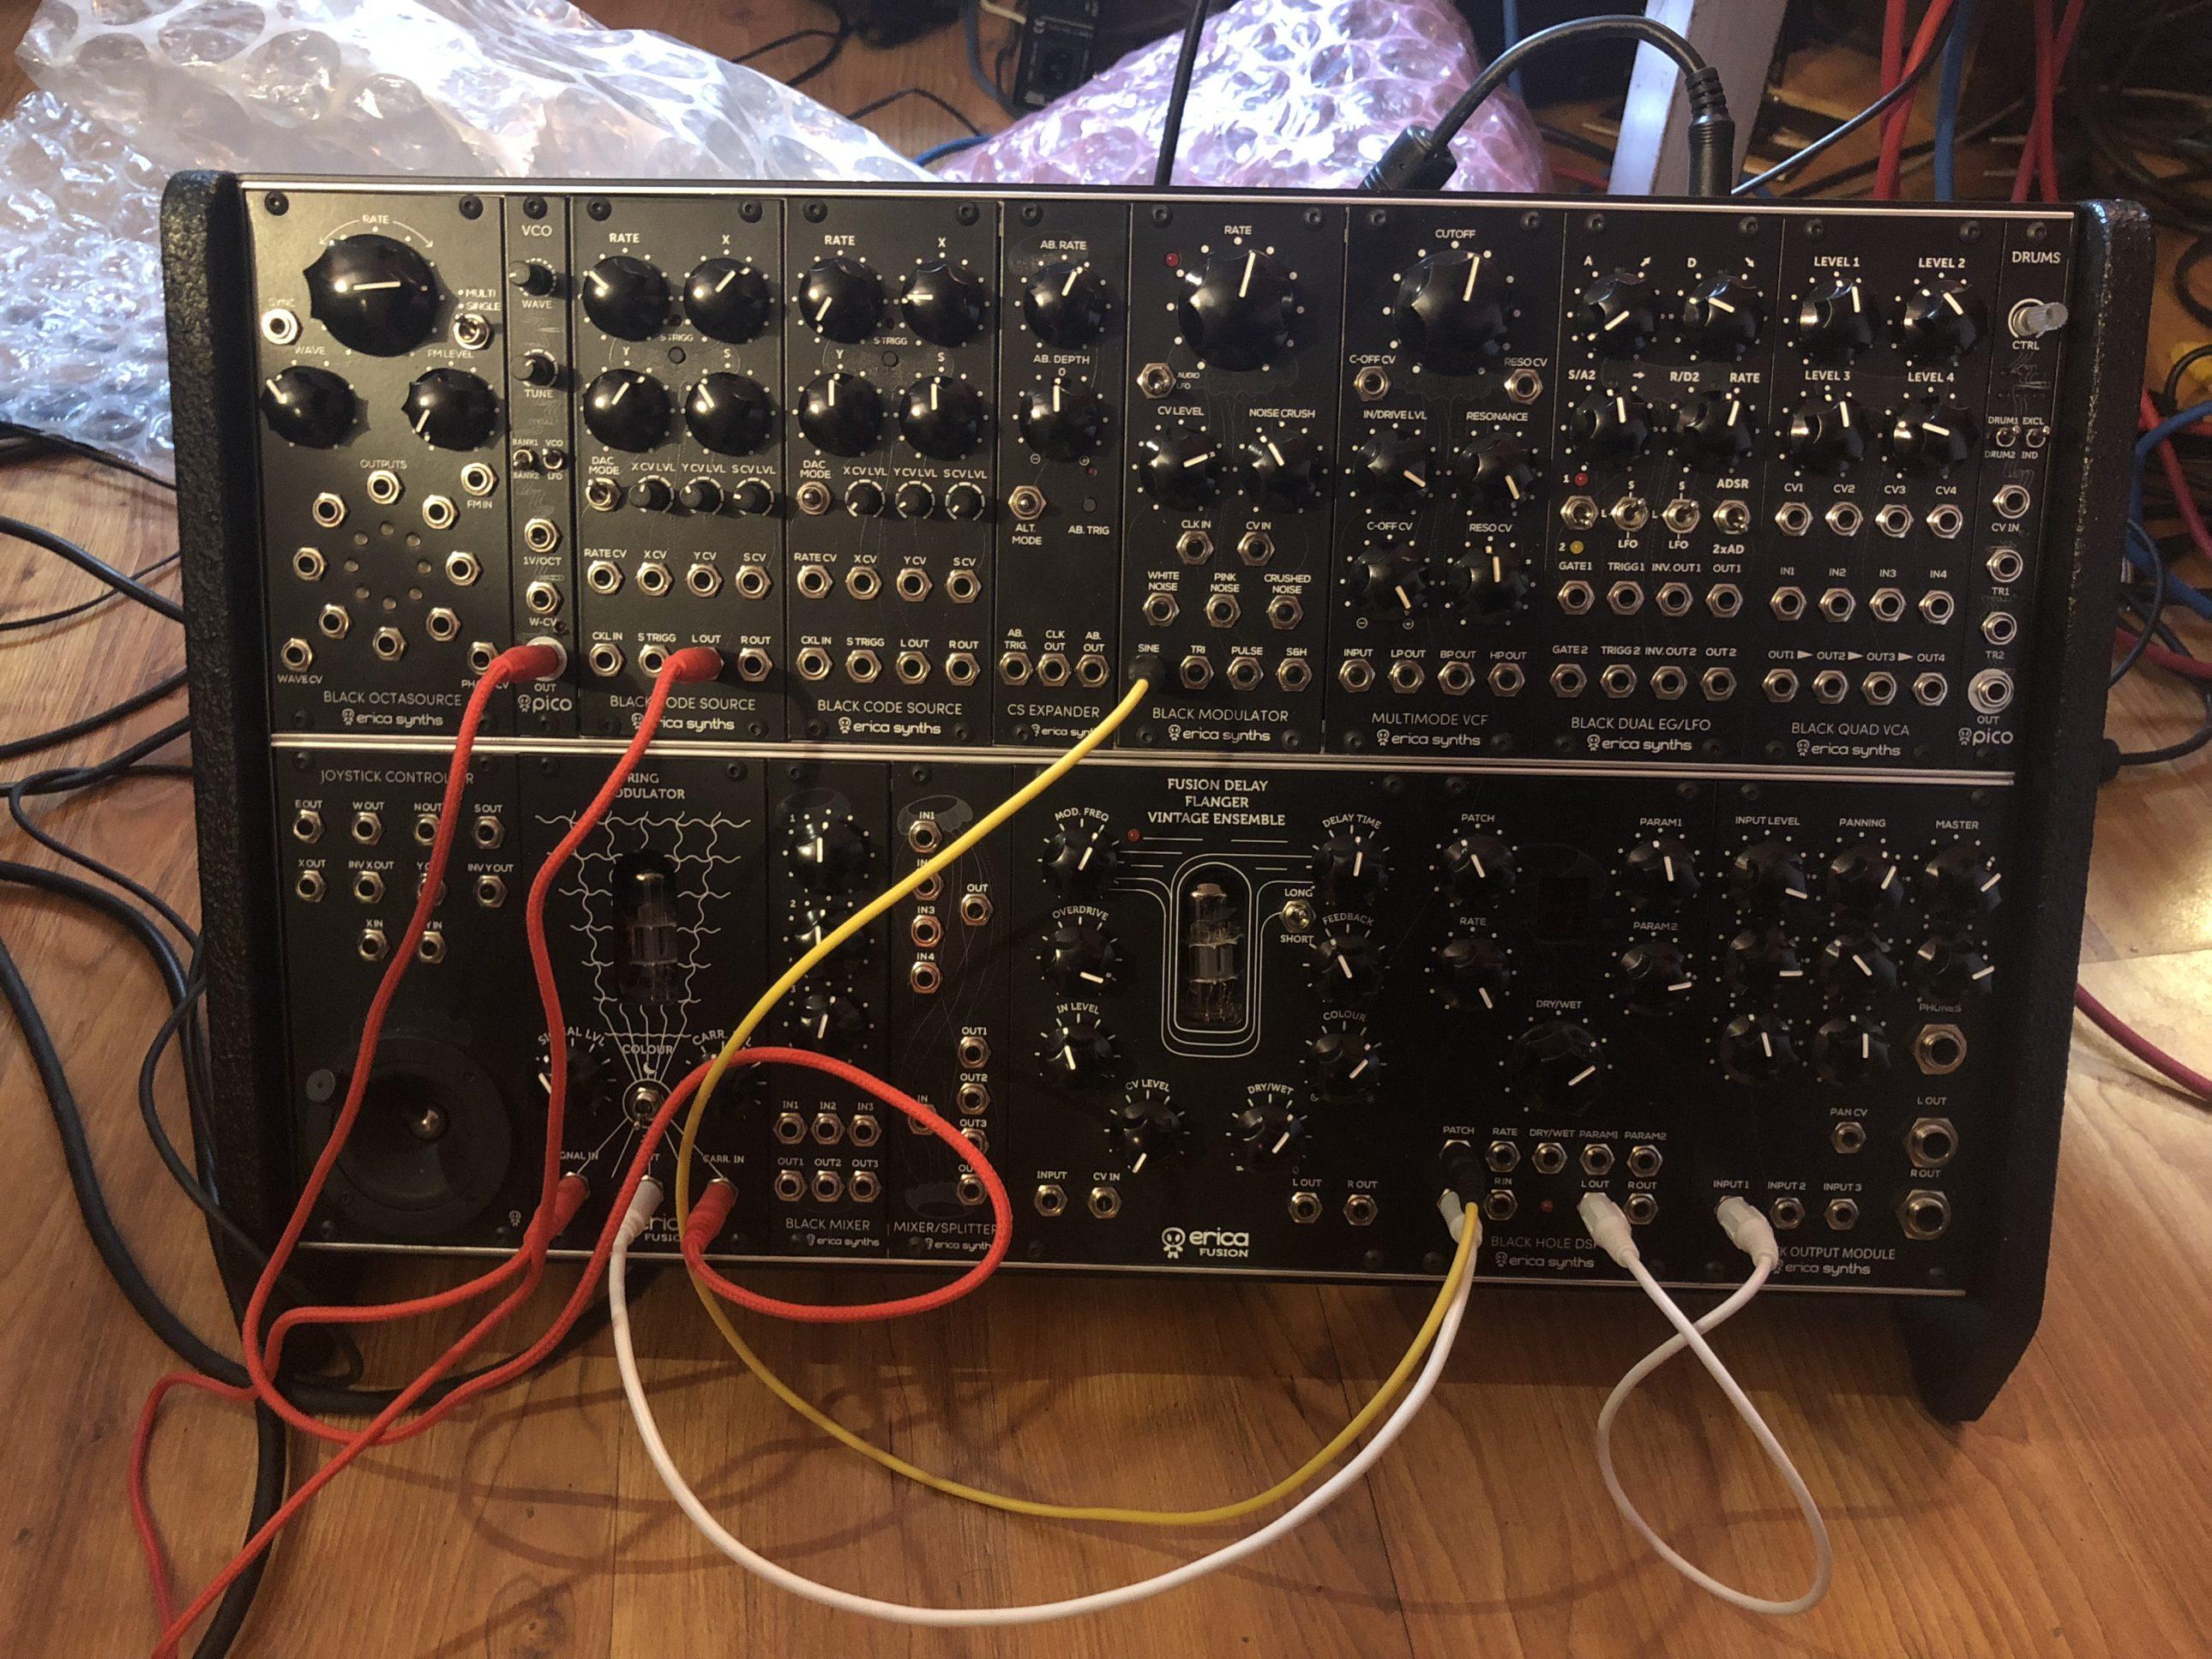 Erica LSB dada noise system